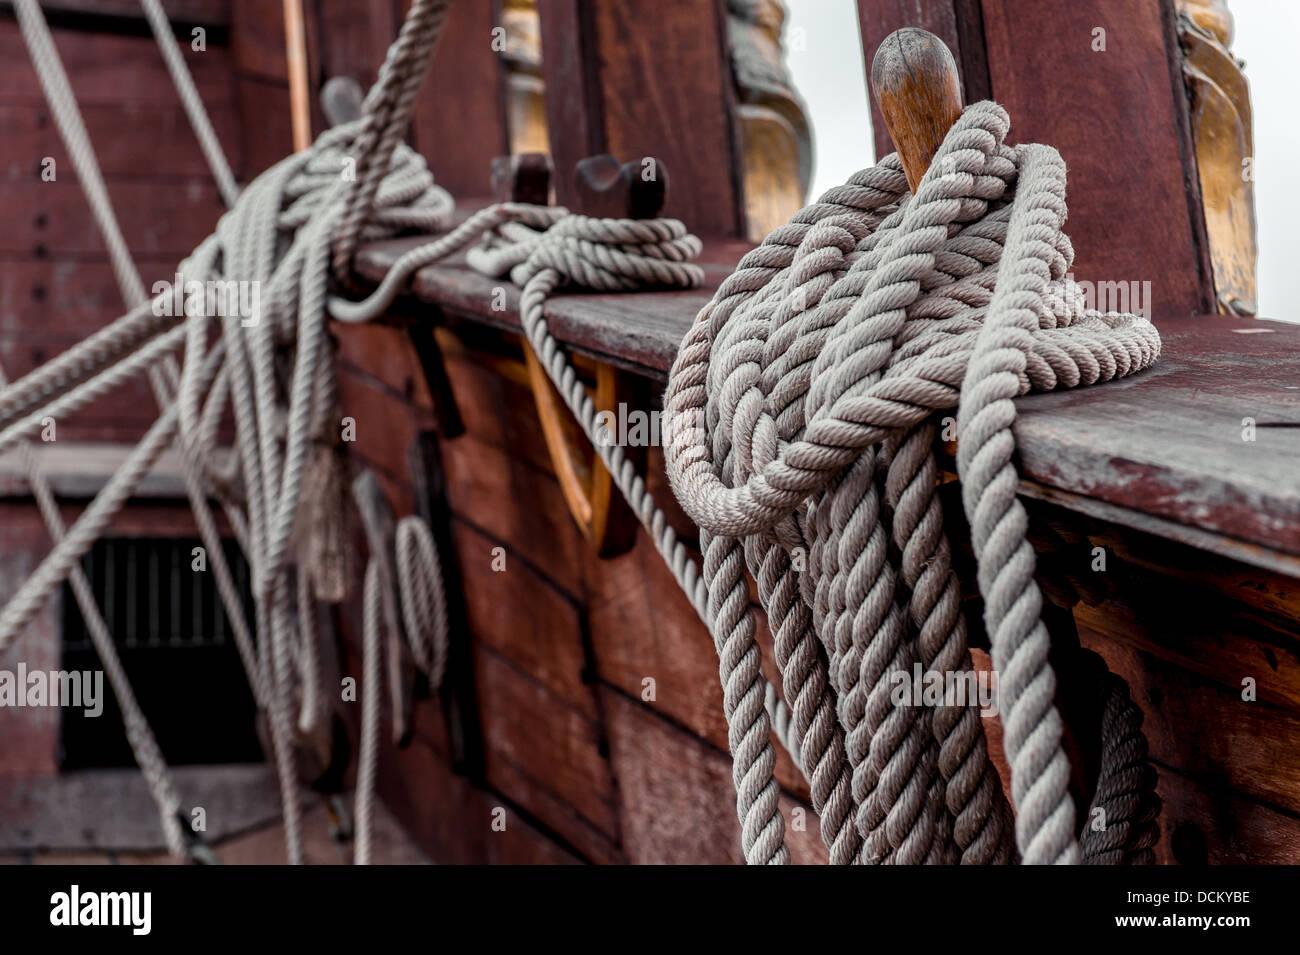 Ship rigging - Stock Image